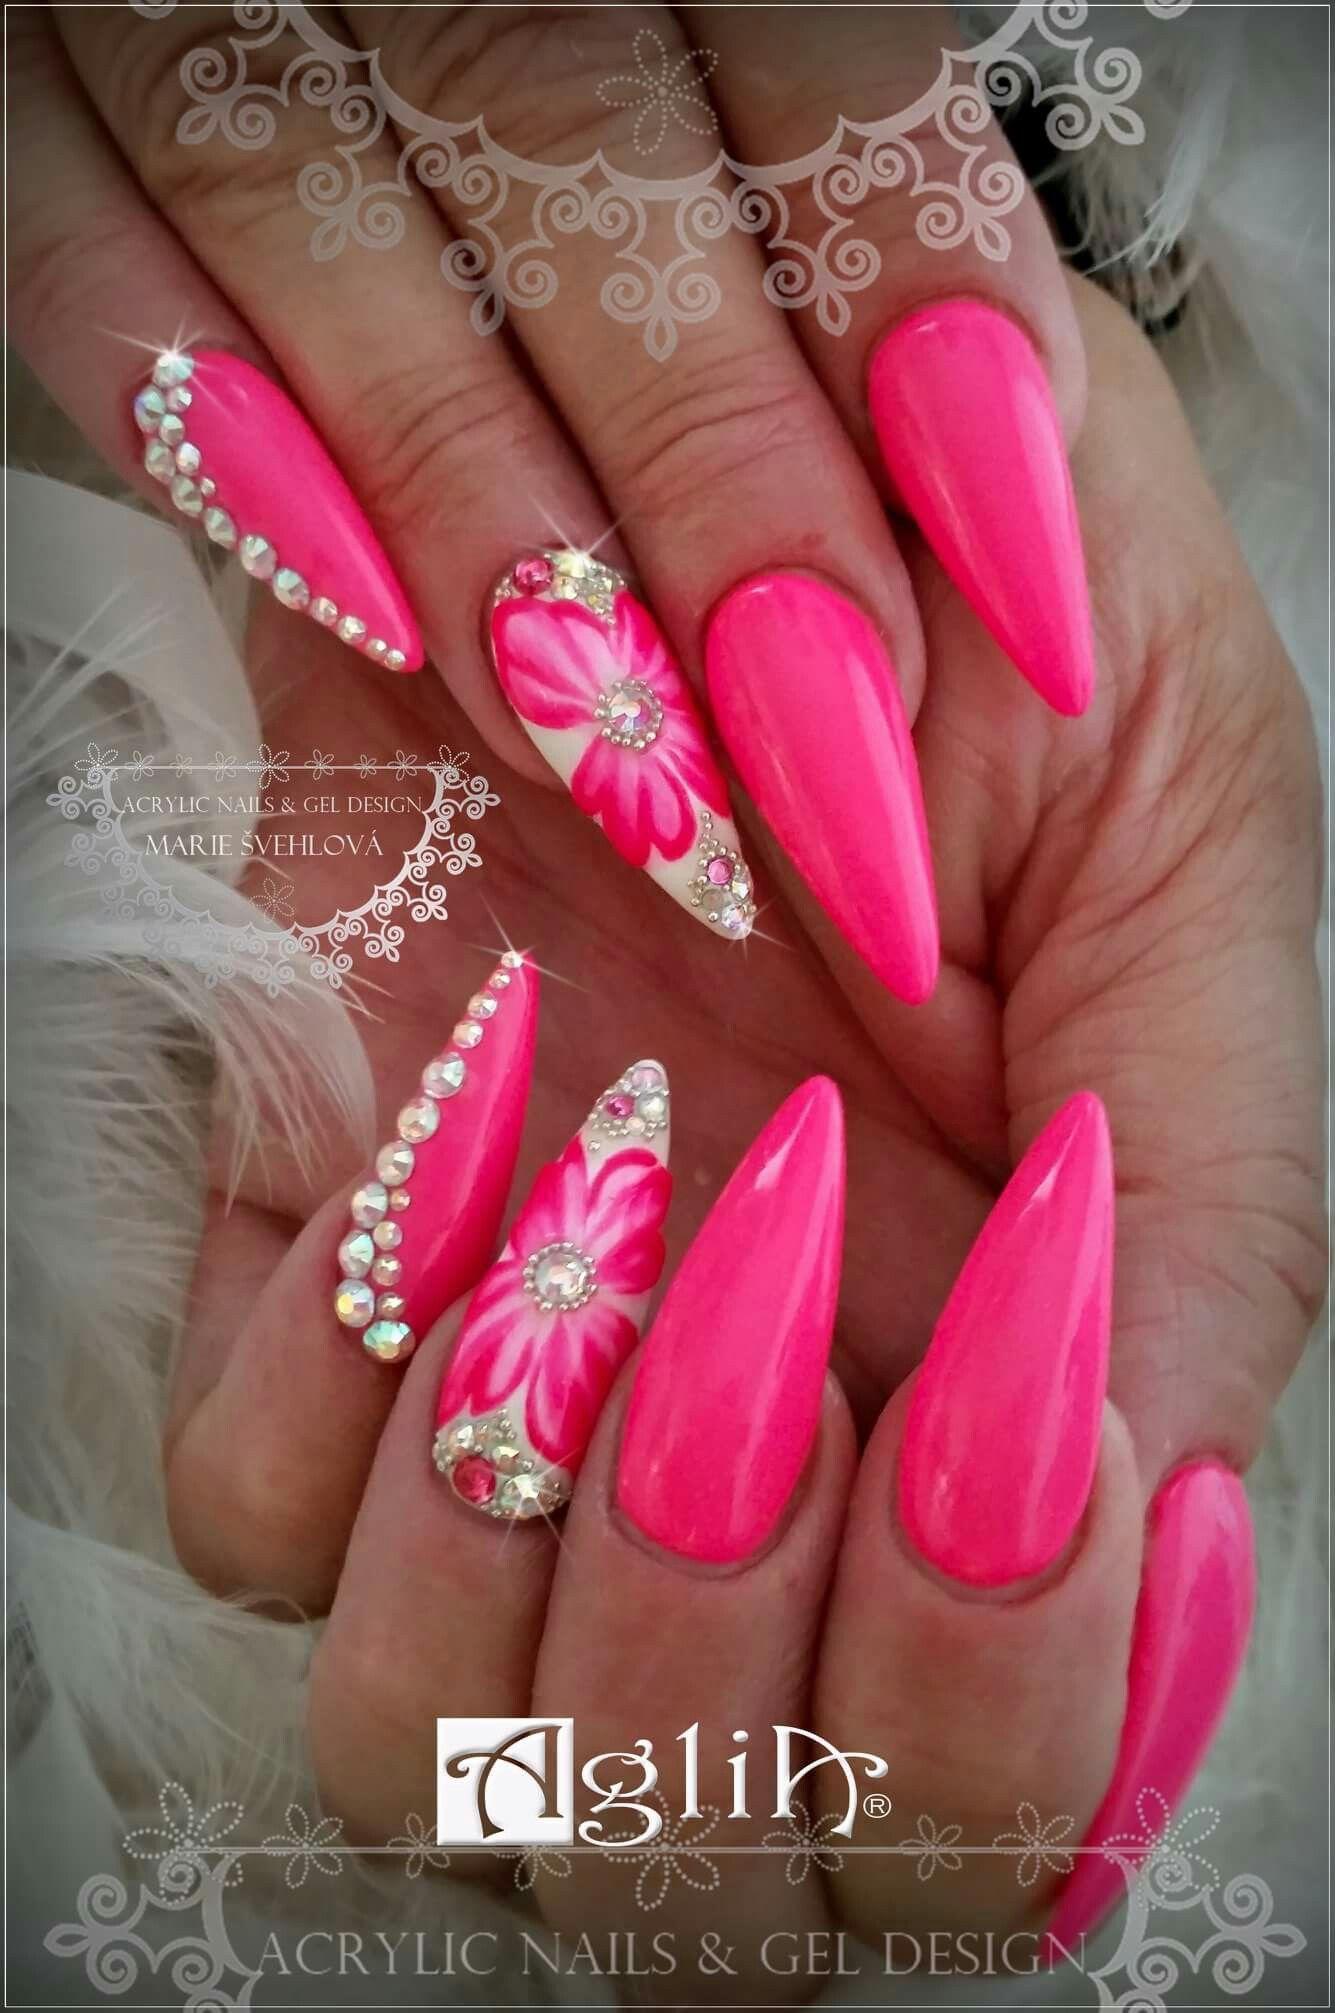 Acrylic Nails Gel Design Pink Nails Neon Pink Neon Pink Nails Pink Nails Pink Nail Designs